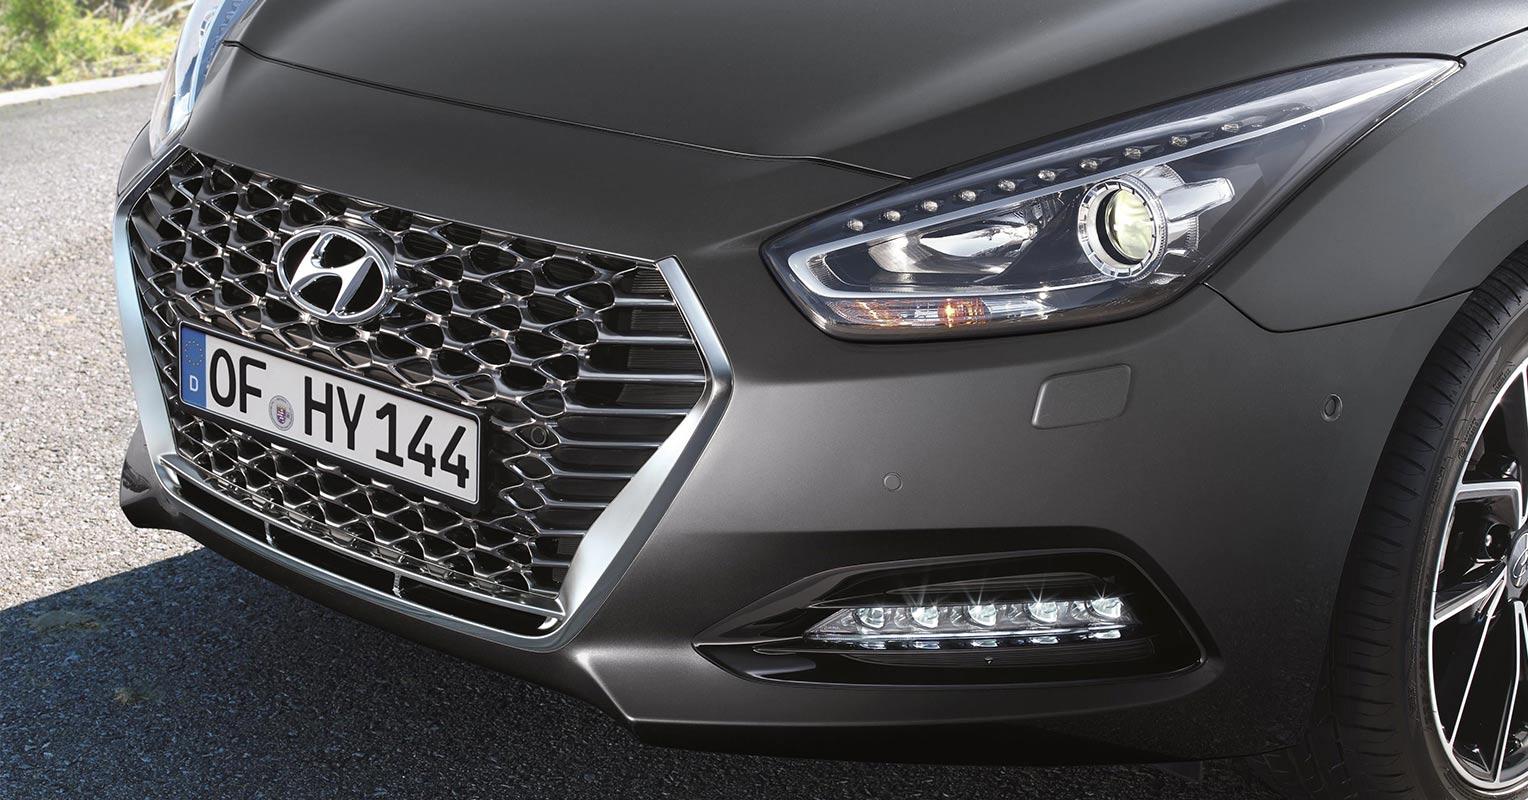 Frontal del Hyundai i40 2019